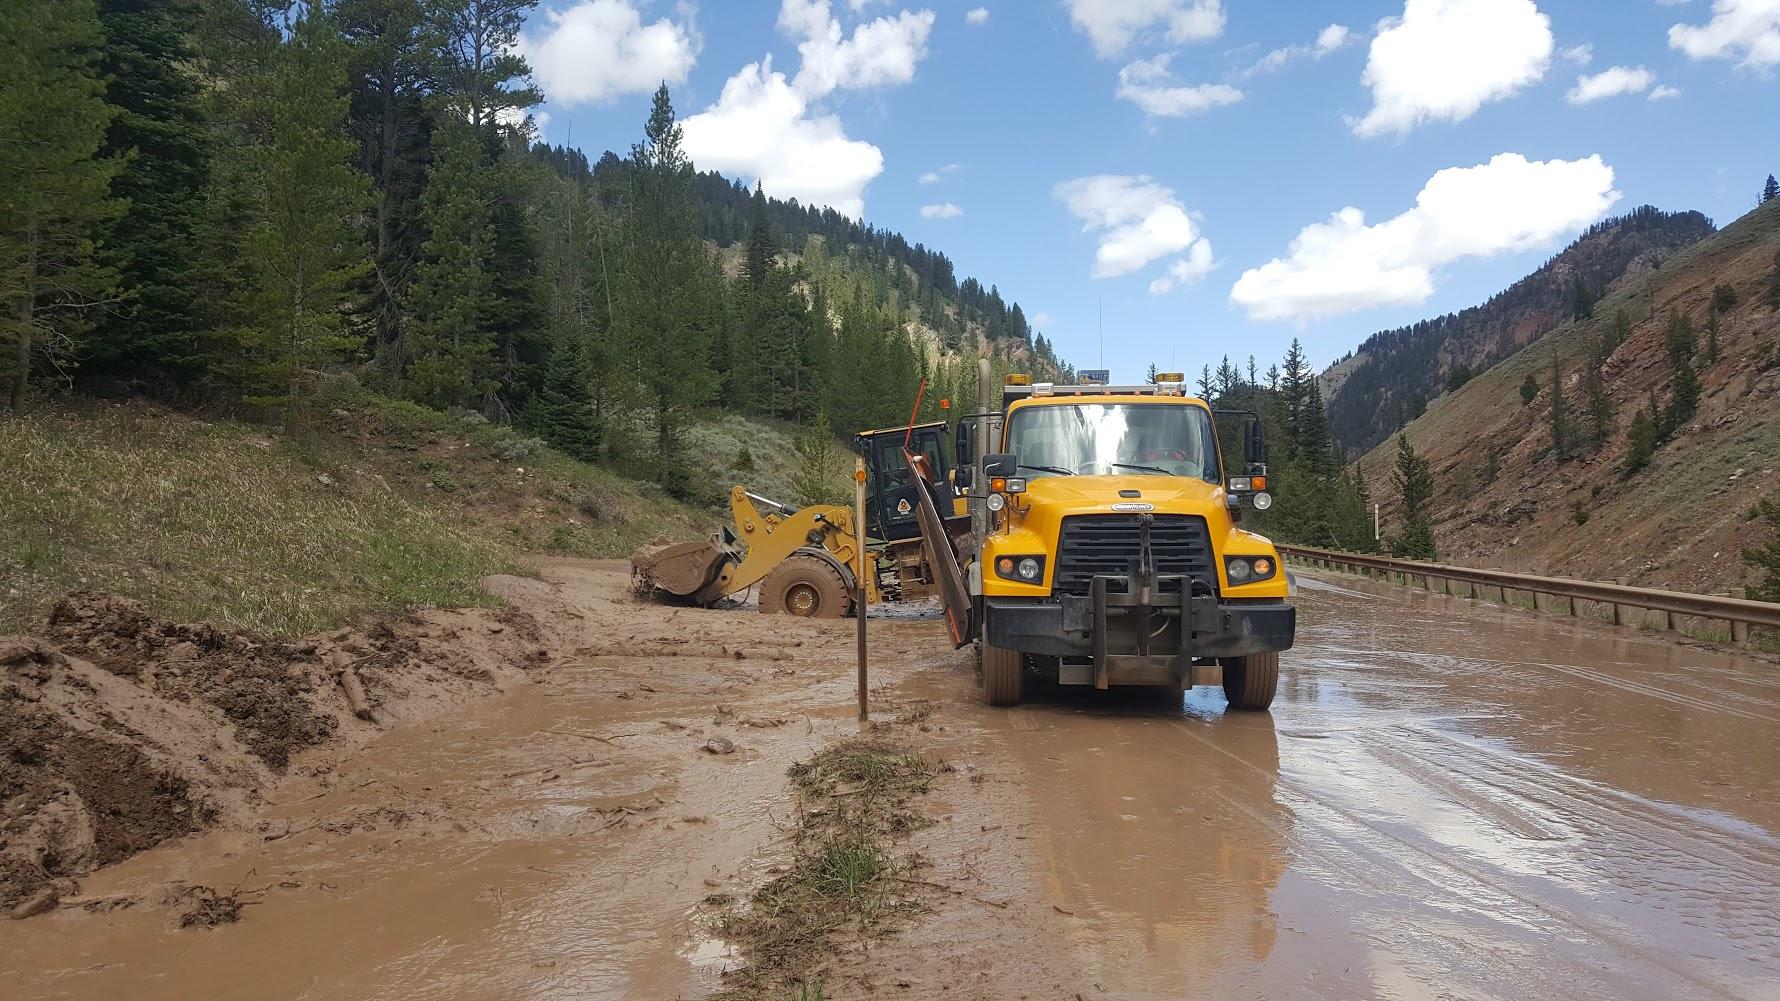 Mud Slide in Hoback Canyon Comes Down Again